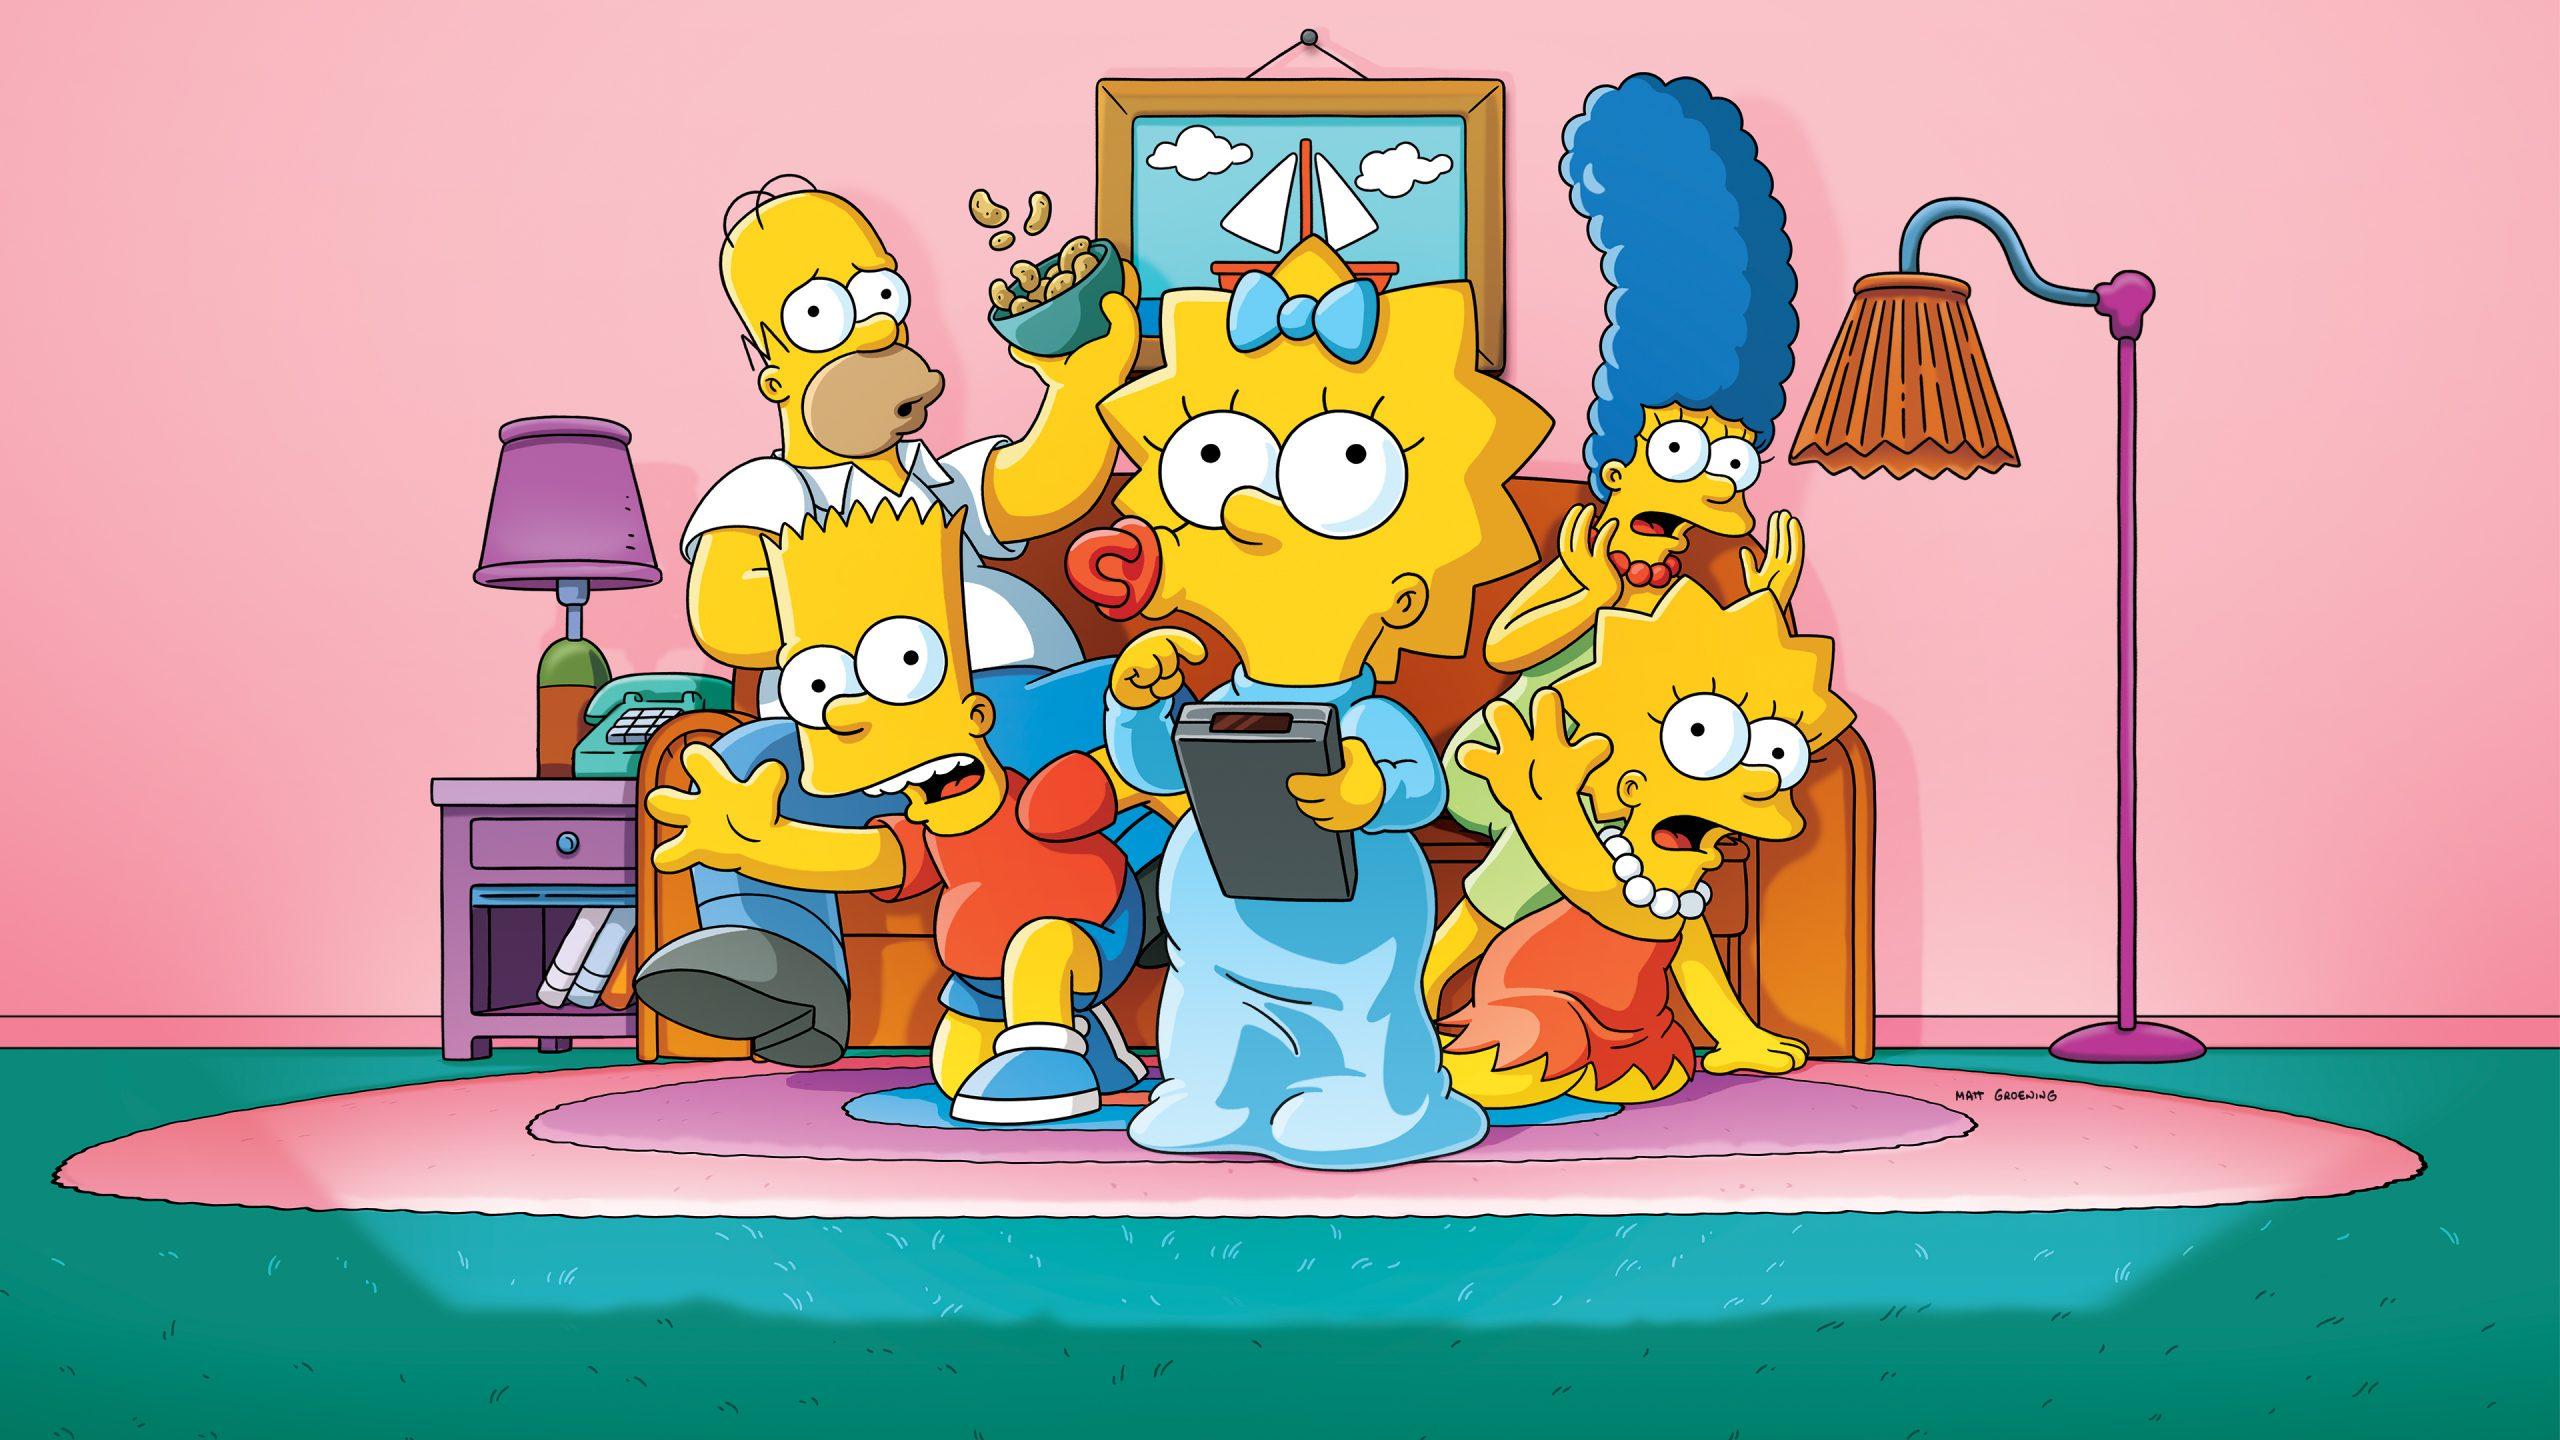 The Simpsons Season 31 Episode 19